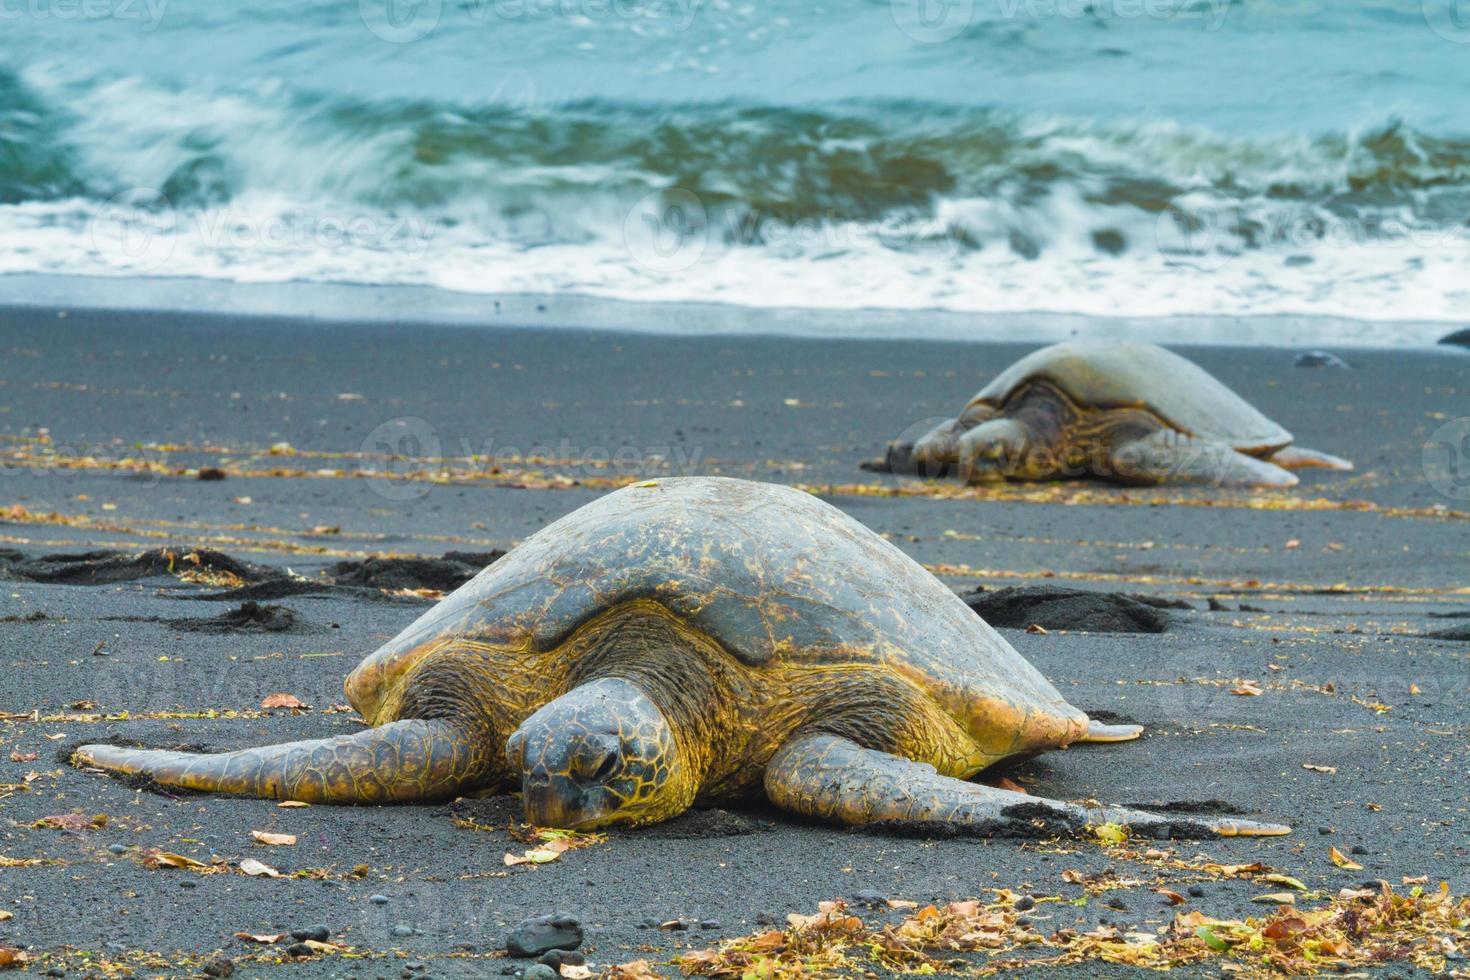 Green sea turtles photo